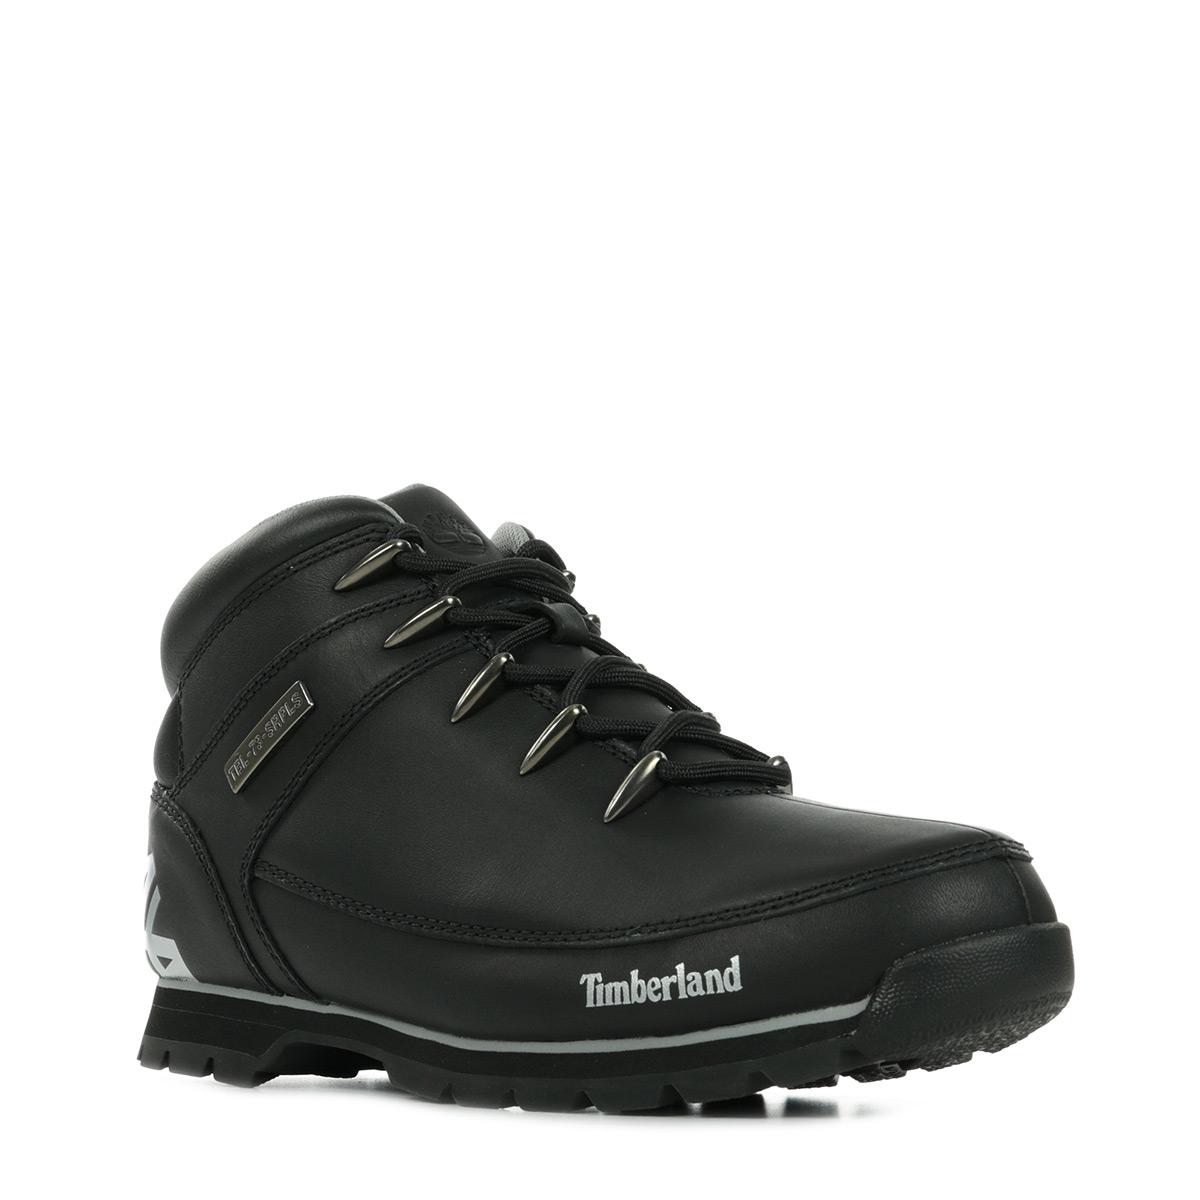 Timberland Euro Sprint Hiker Black Reflective